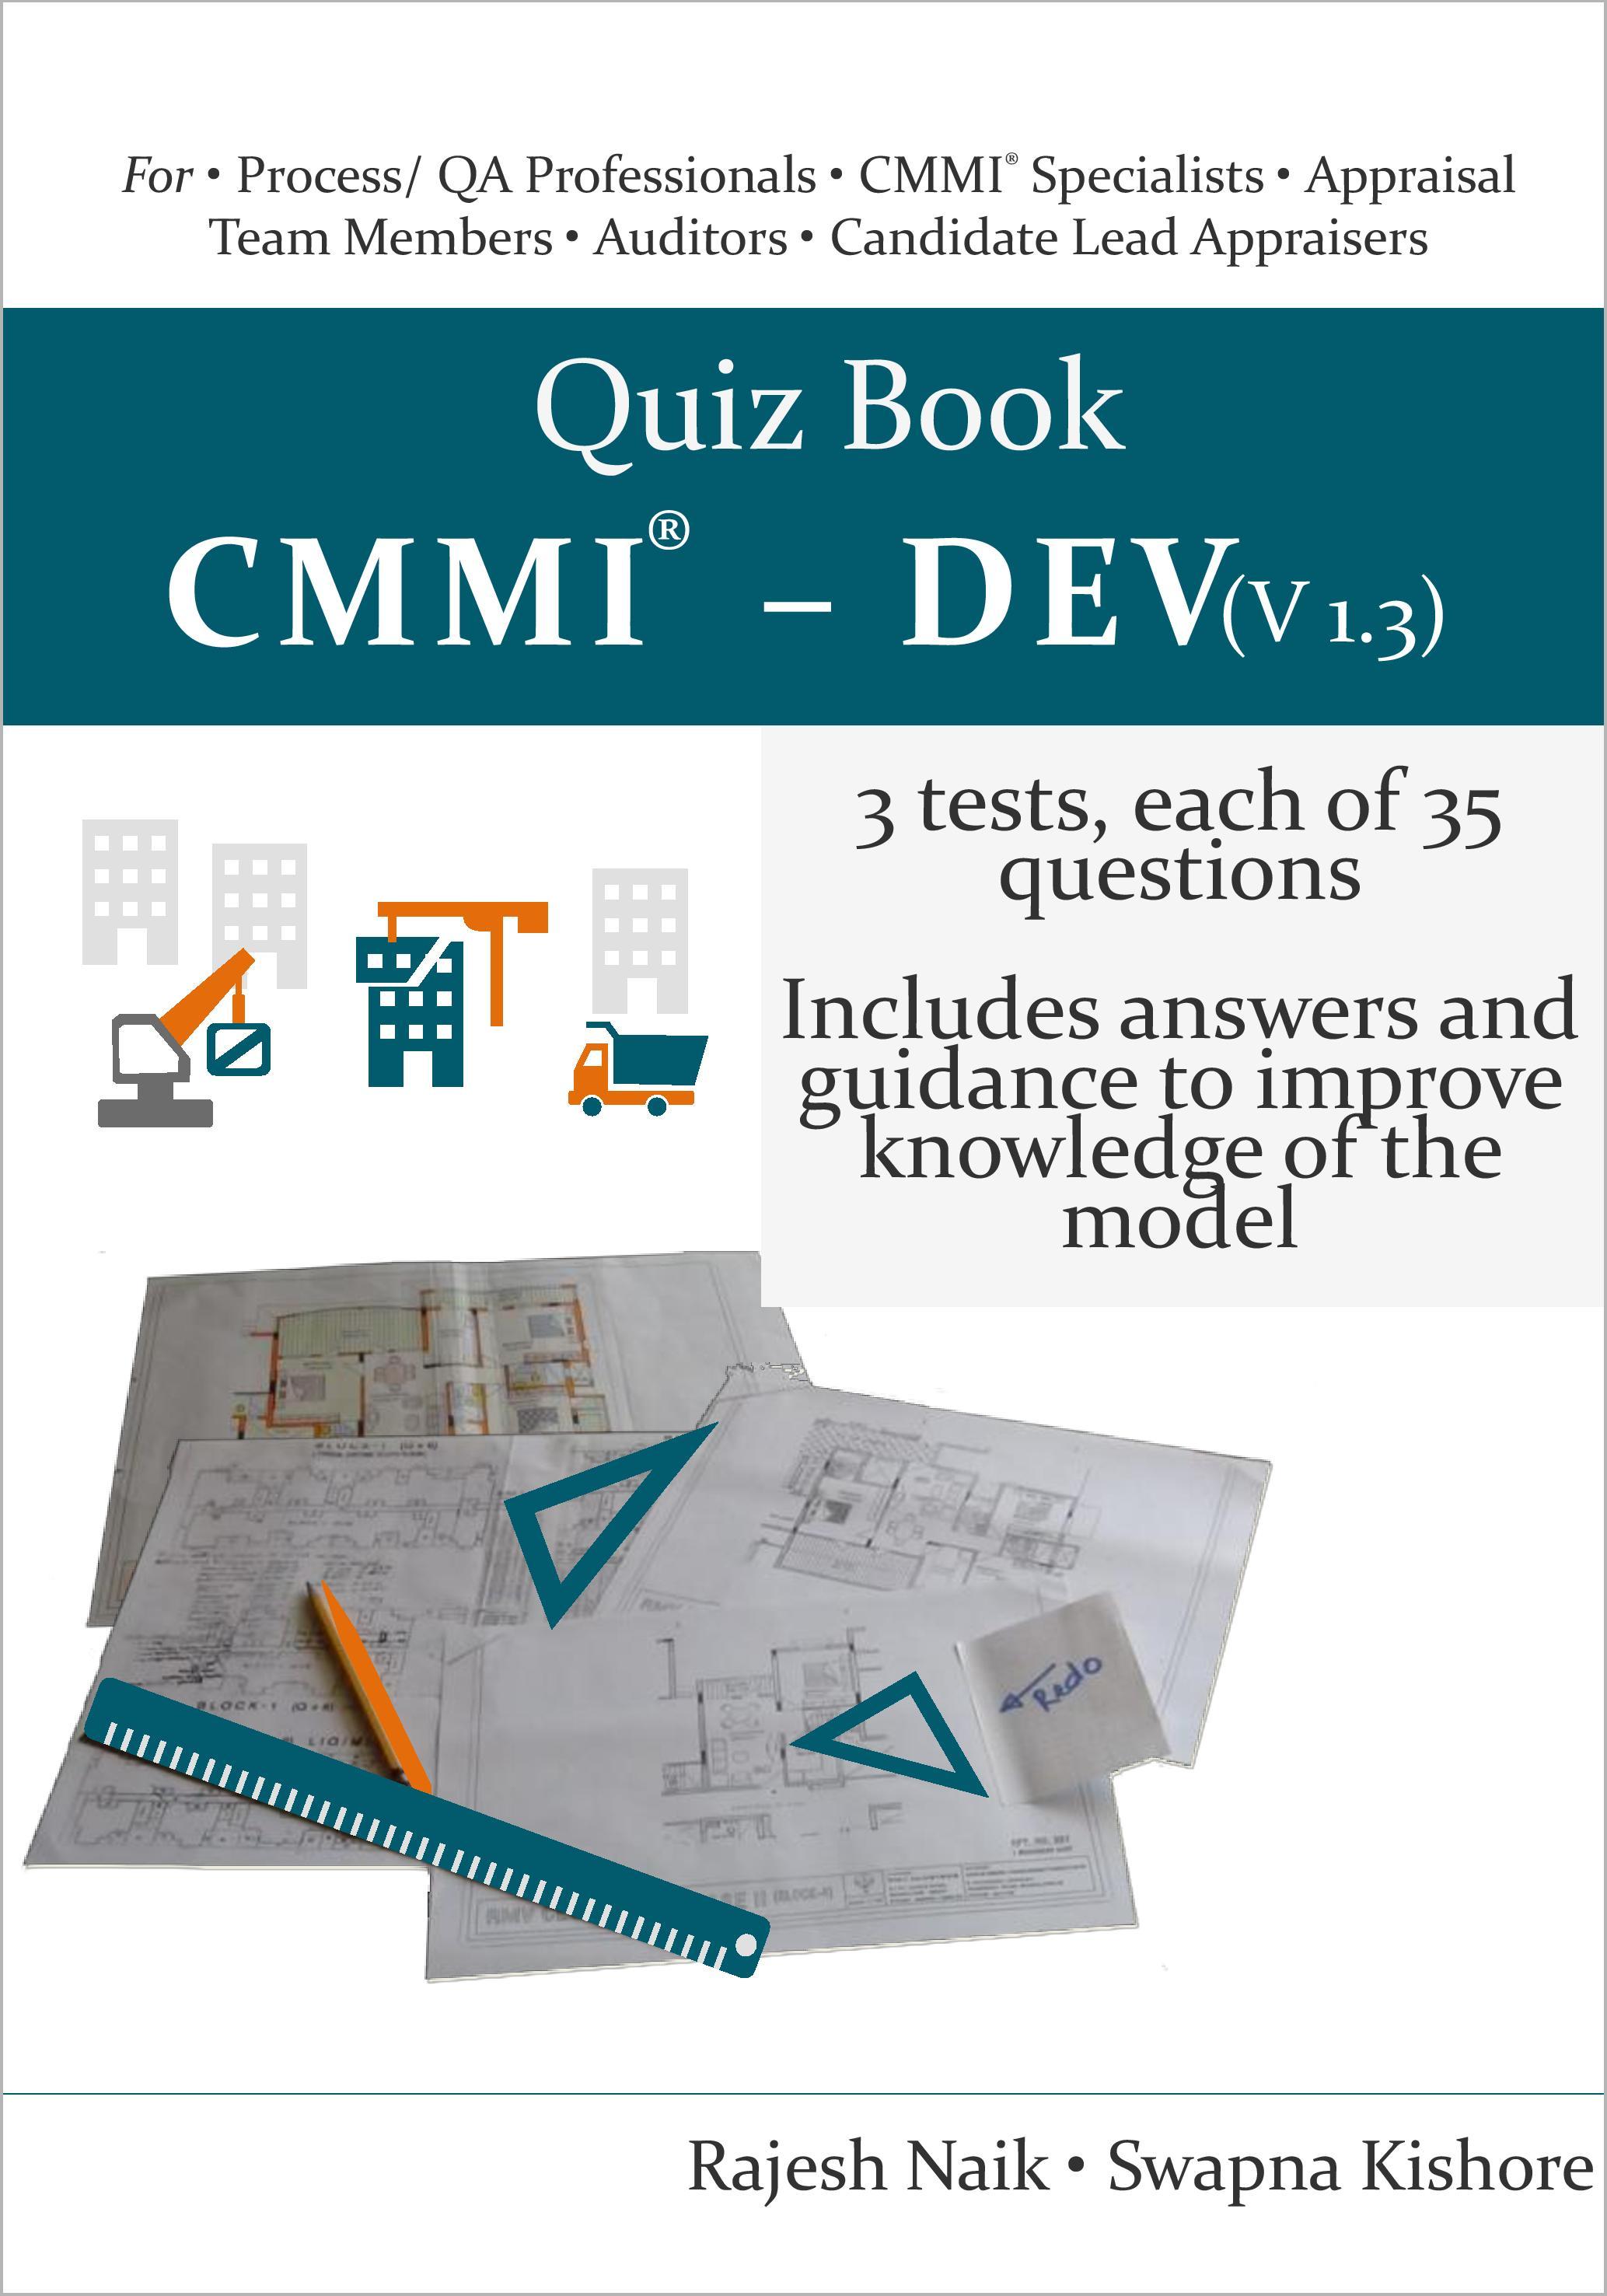 Quiz Book: CMMI® - DEV (v1.3) Book Cover